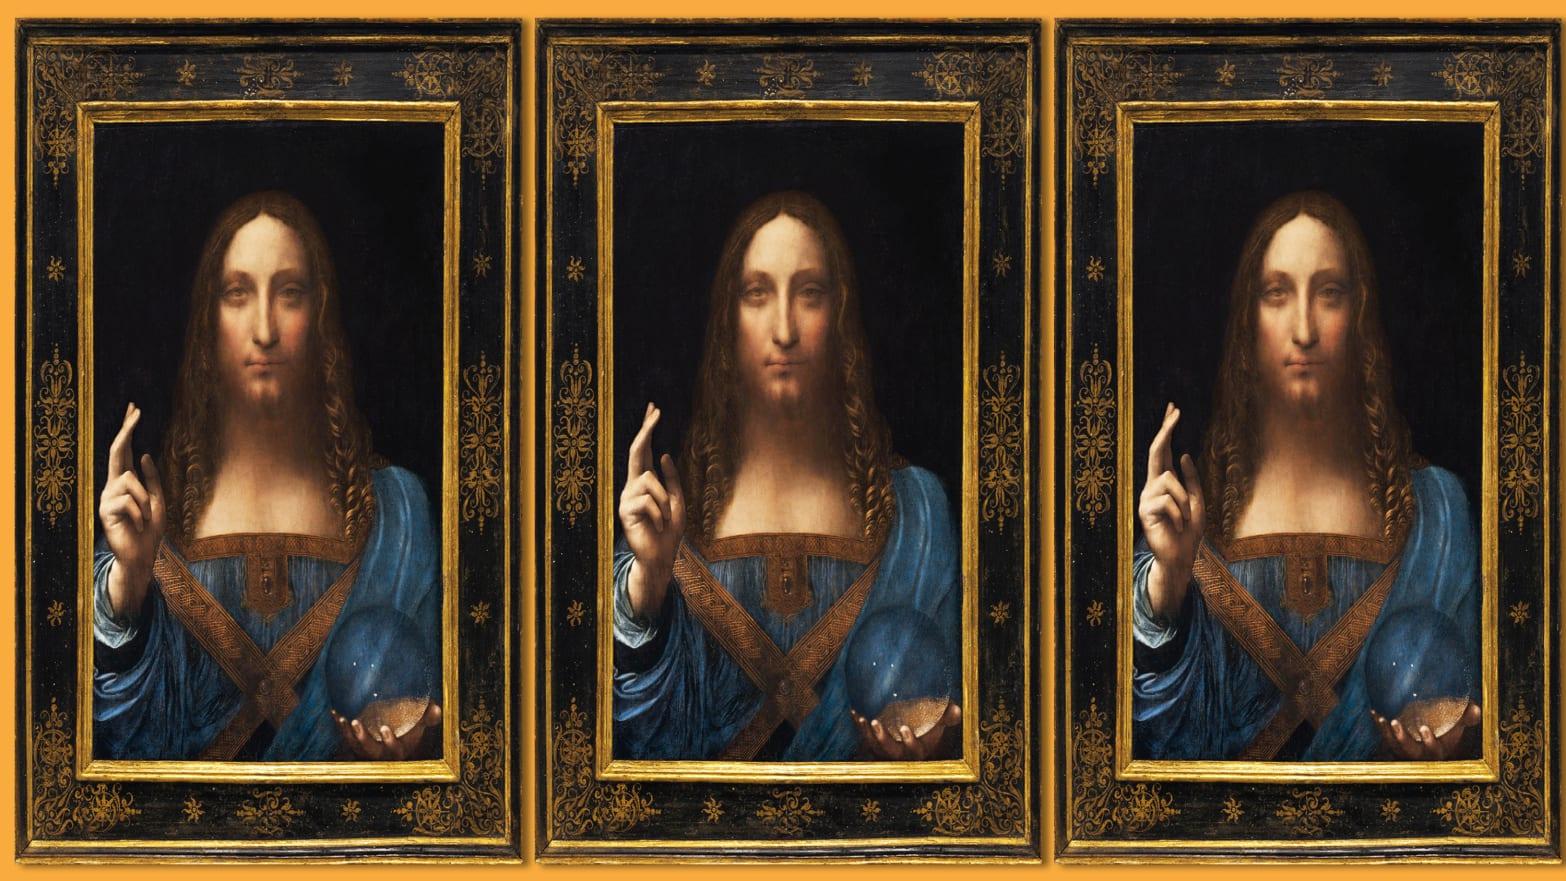 Is This $450 Million Da Vinci Really on a Saudi Crown Prince's Yacht?